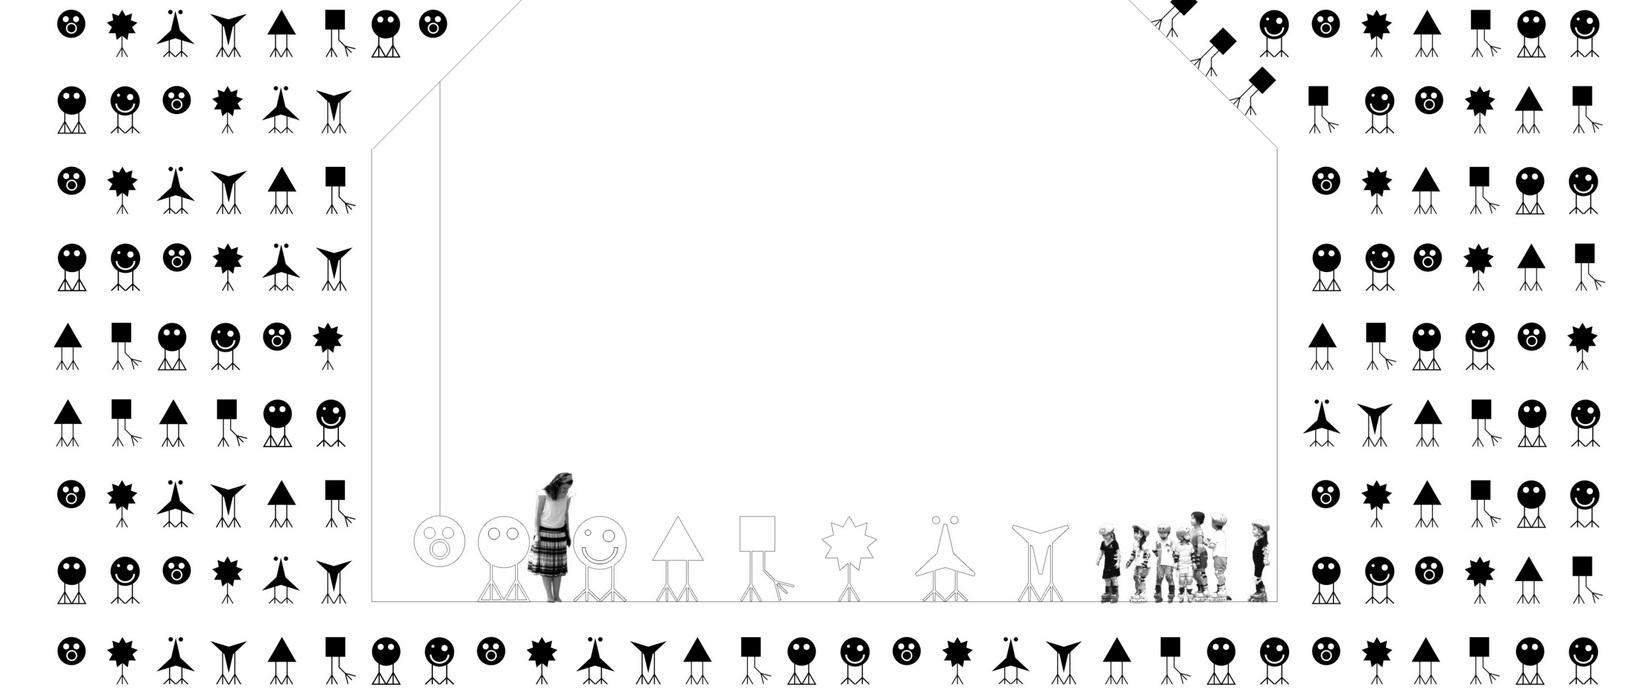 intro-crisan architecture-022